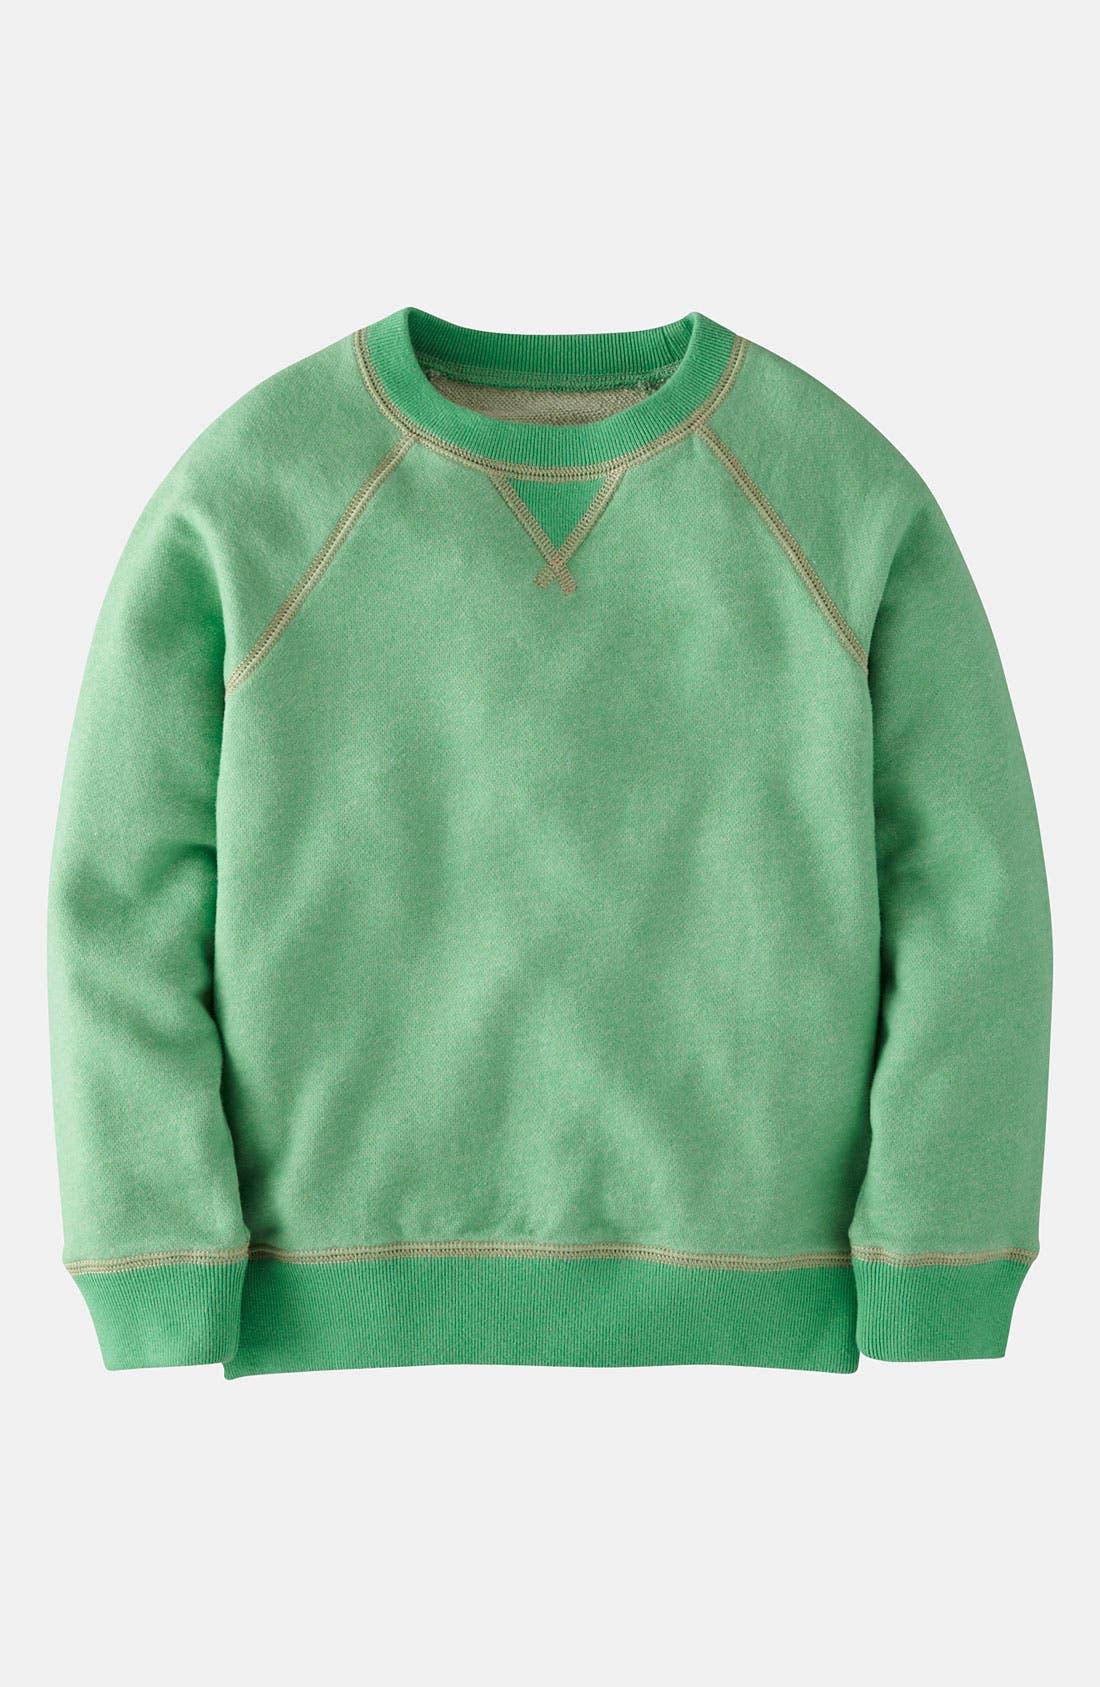 Alternate Image 1 Selected - Mini Boden Crewneck Sweatshirt (Little Boys & Big Boys)